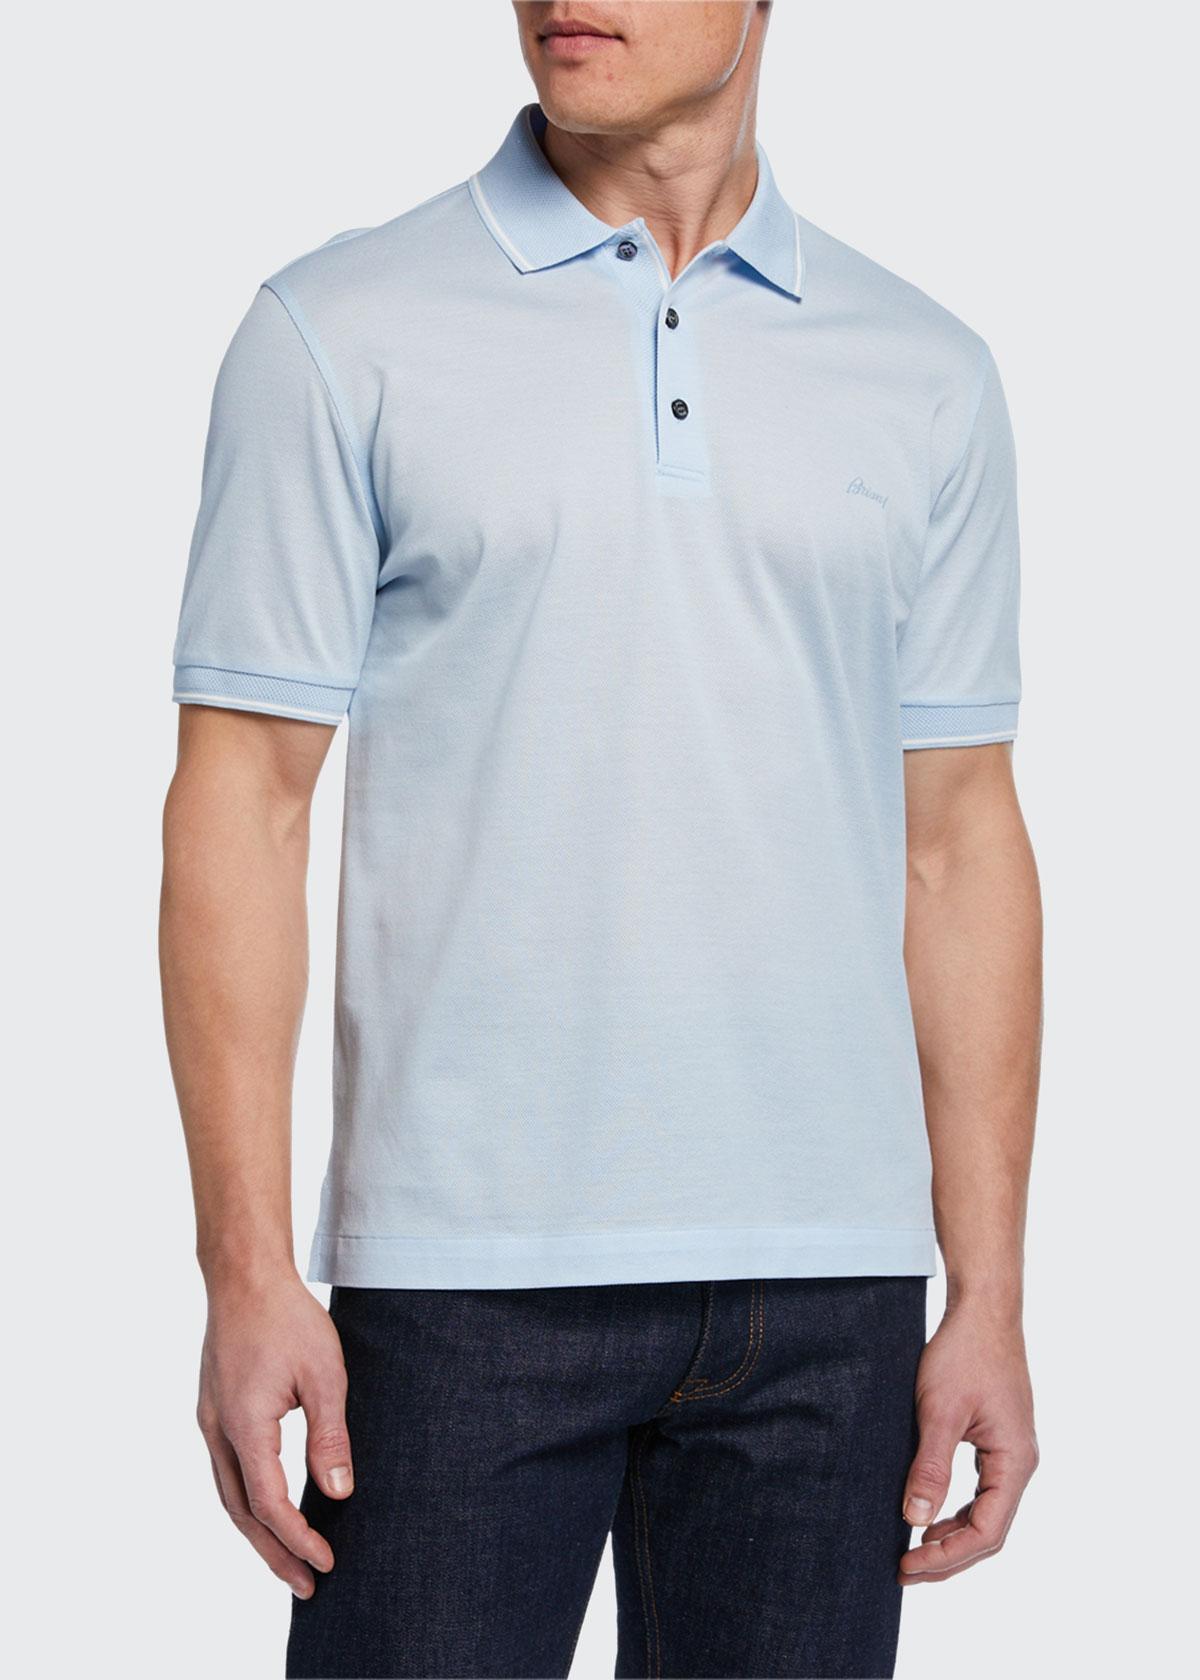 Brioni T-shirts MEN'S TIPPED PIQUE POLO SHIRT